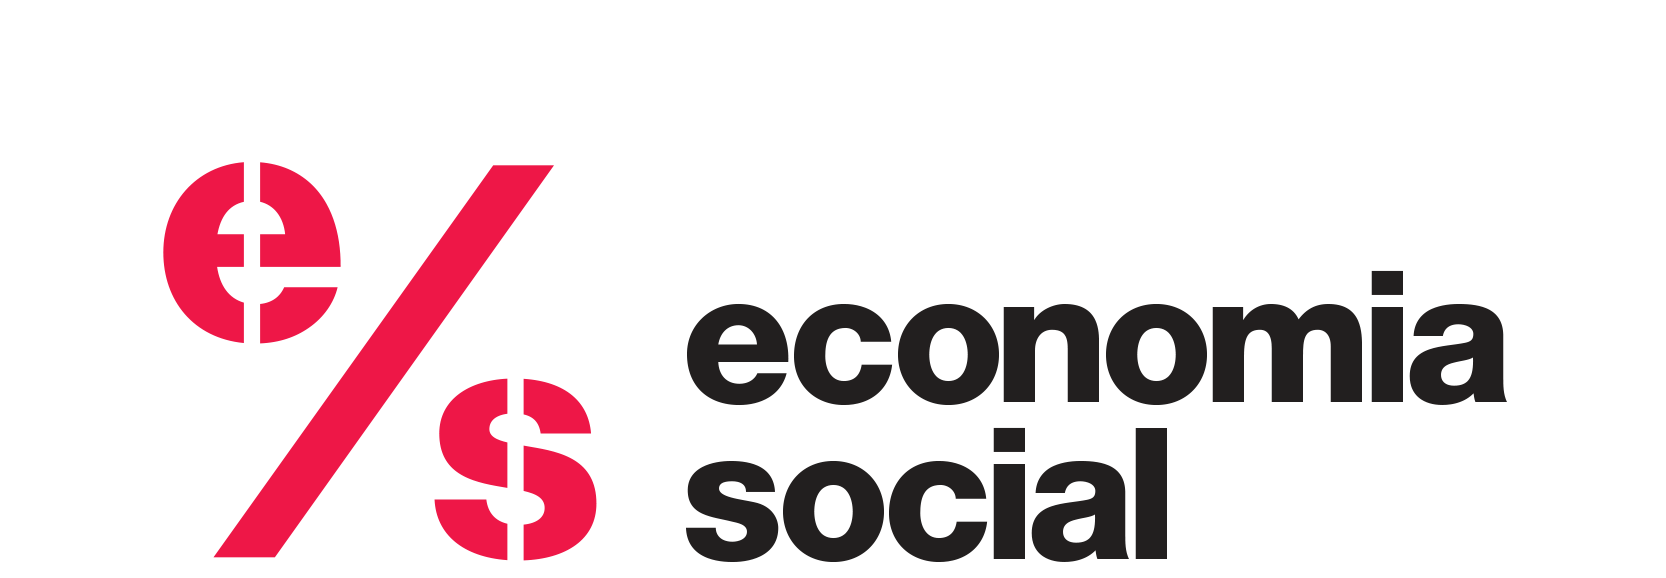 economia social hrt